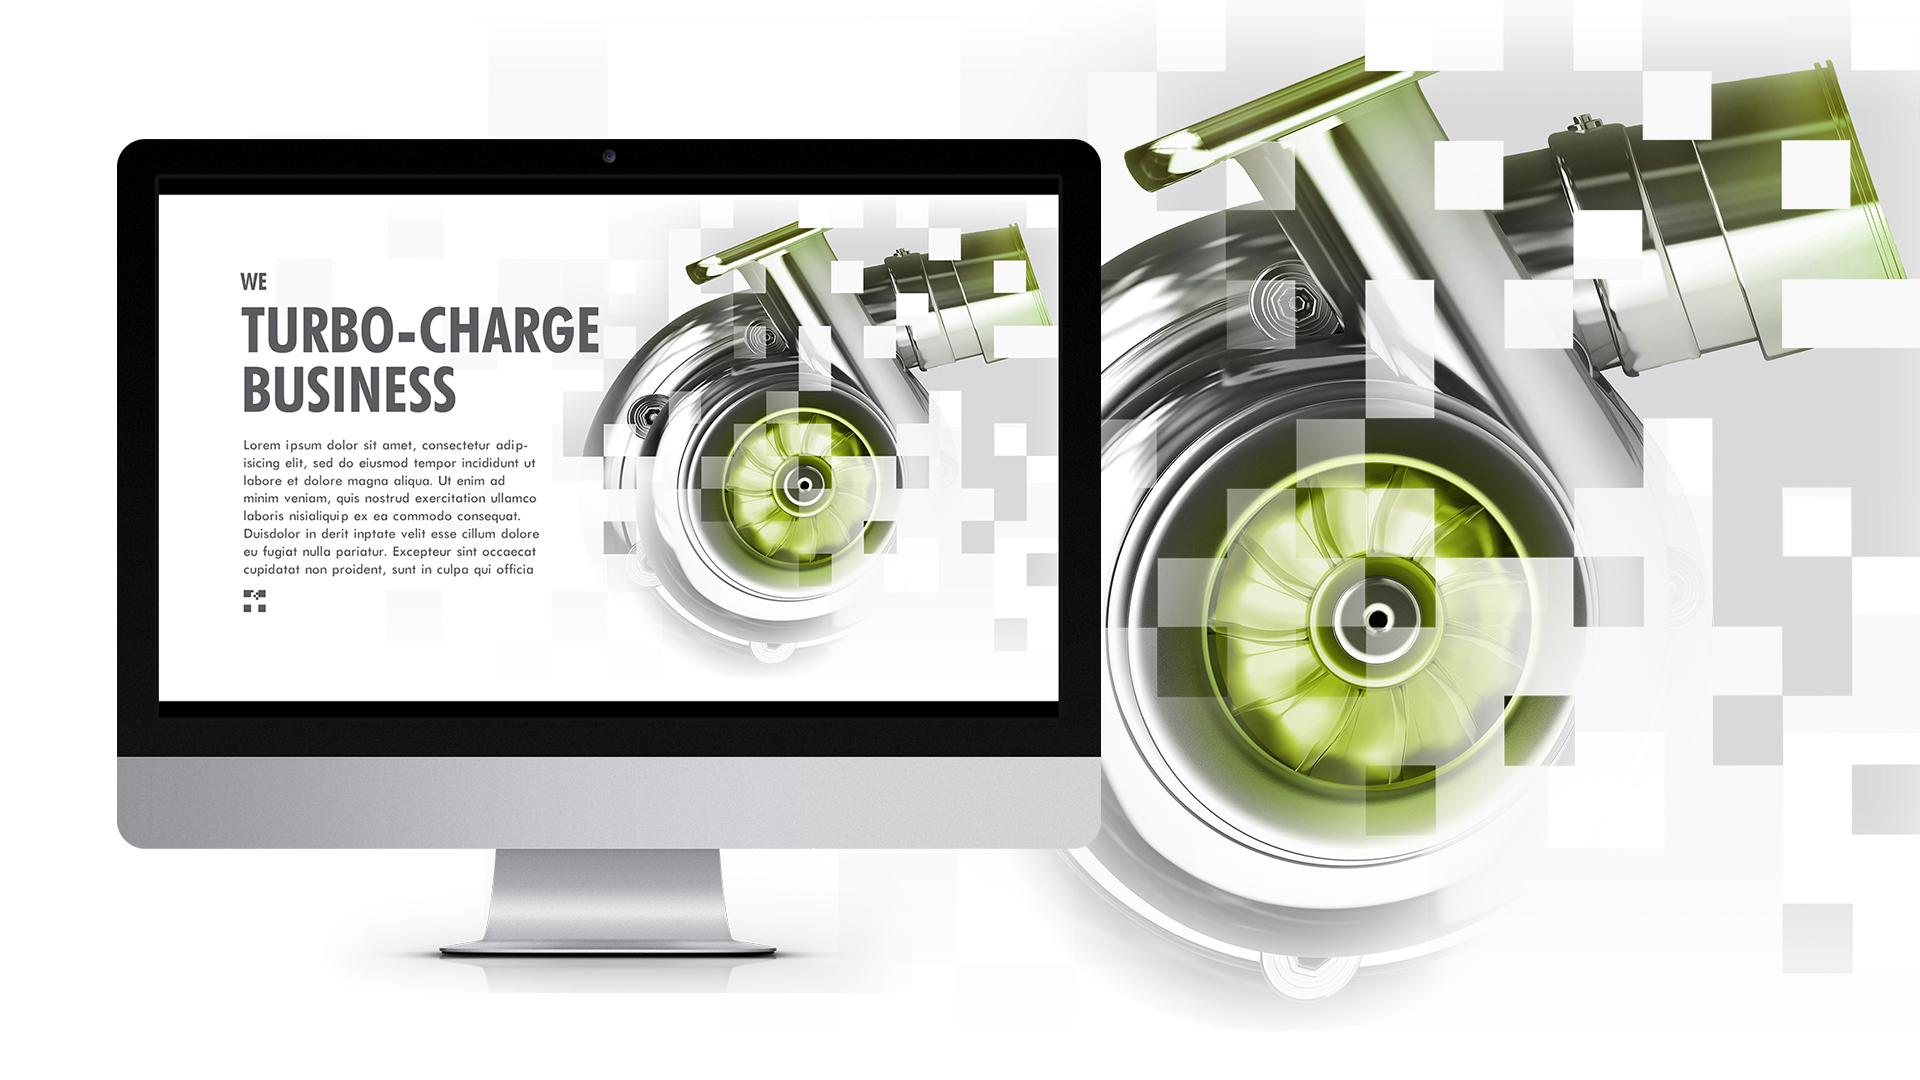 Vinformatix 3D Mockup TurboCharge.jpg